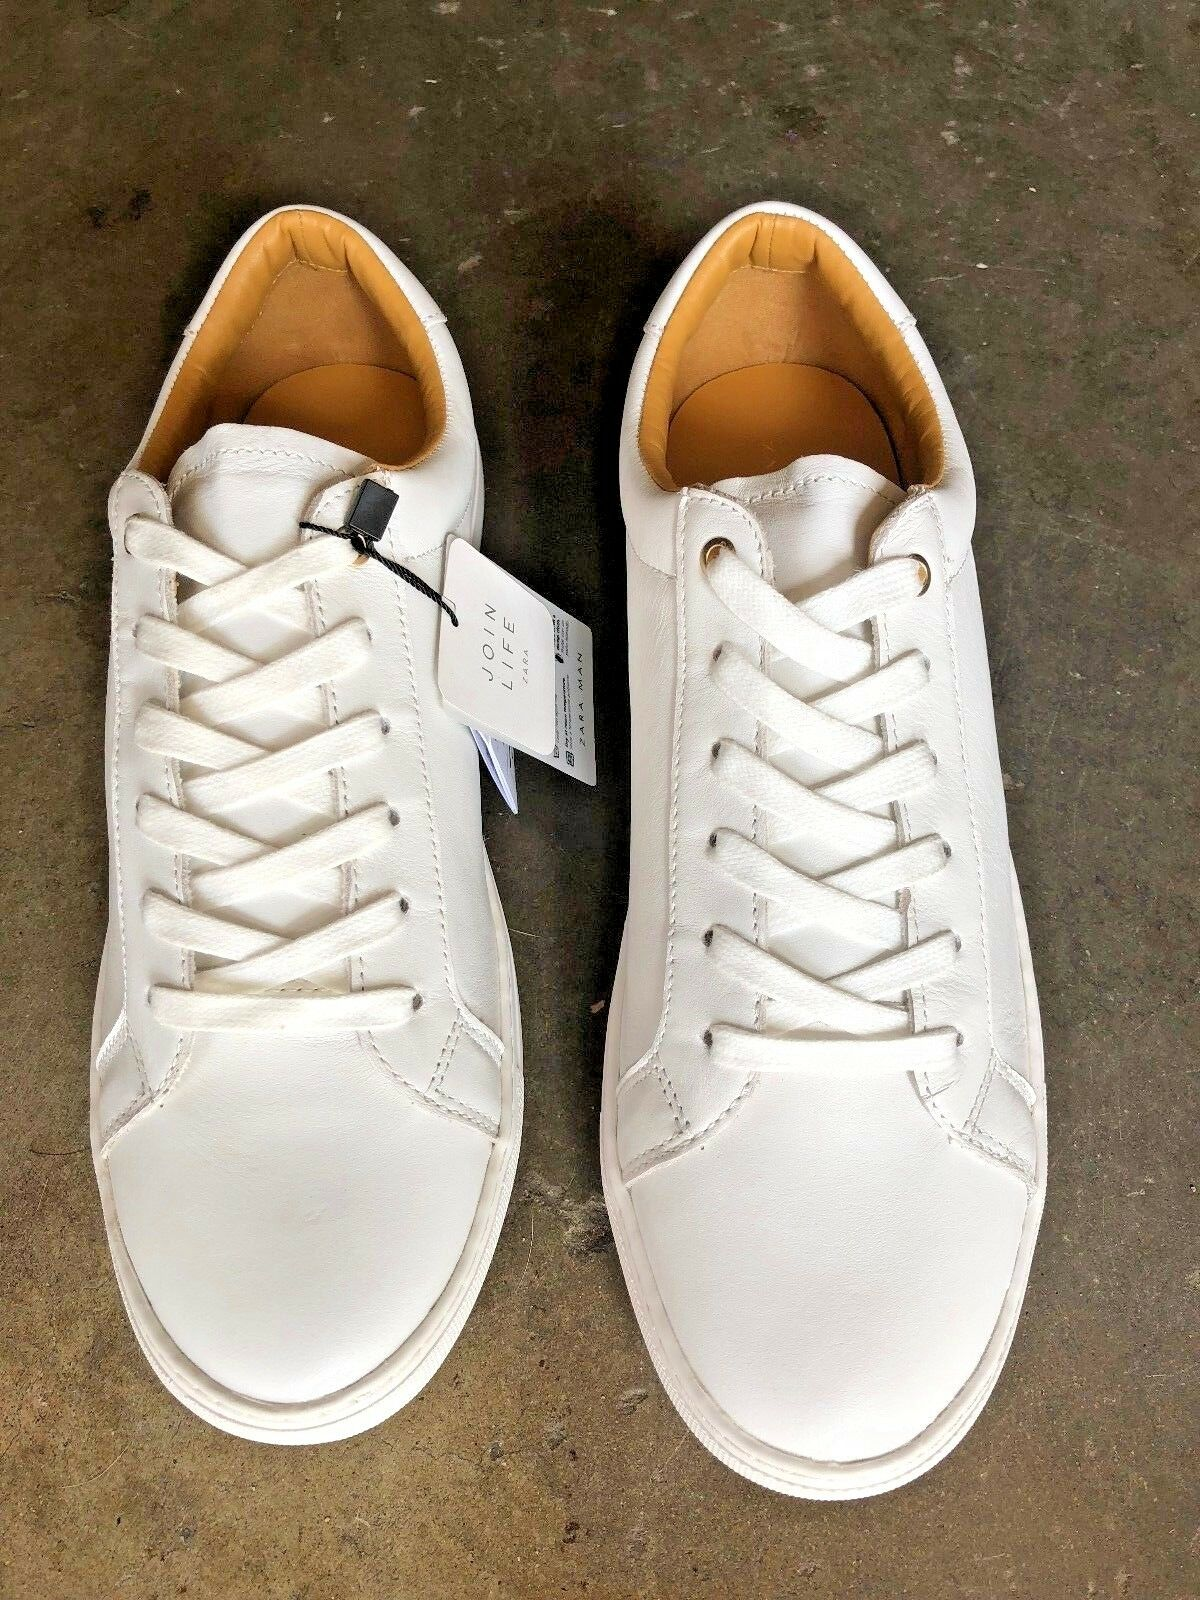 Zara Man Walking shoes New Low Top White